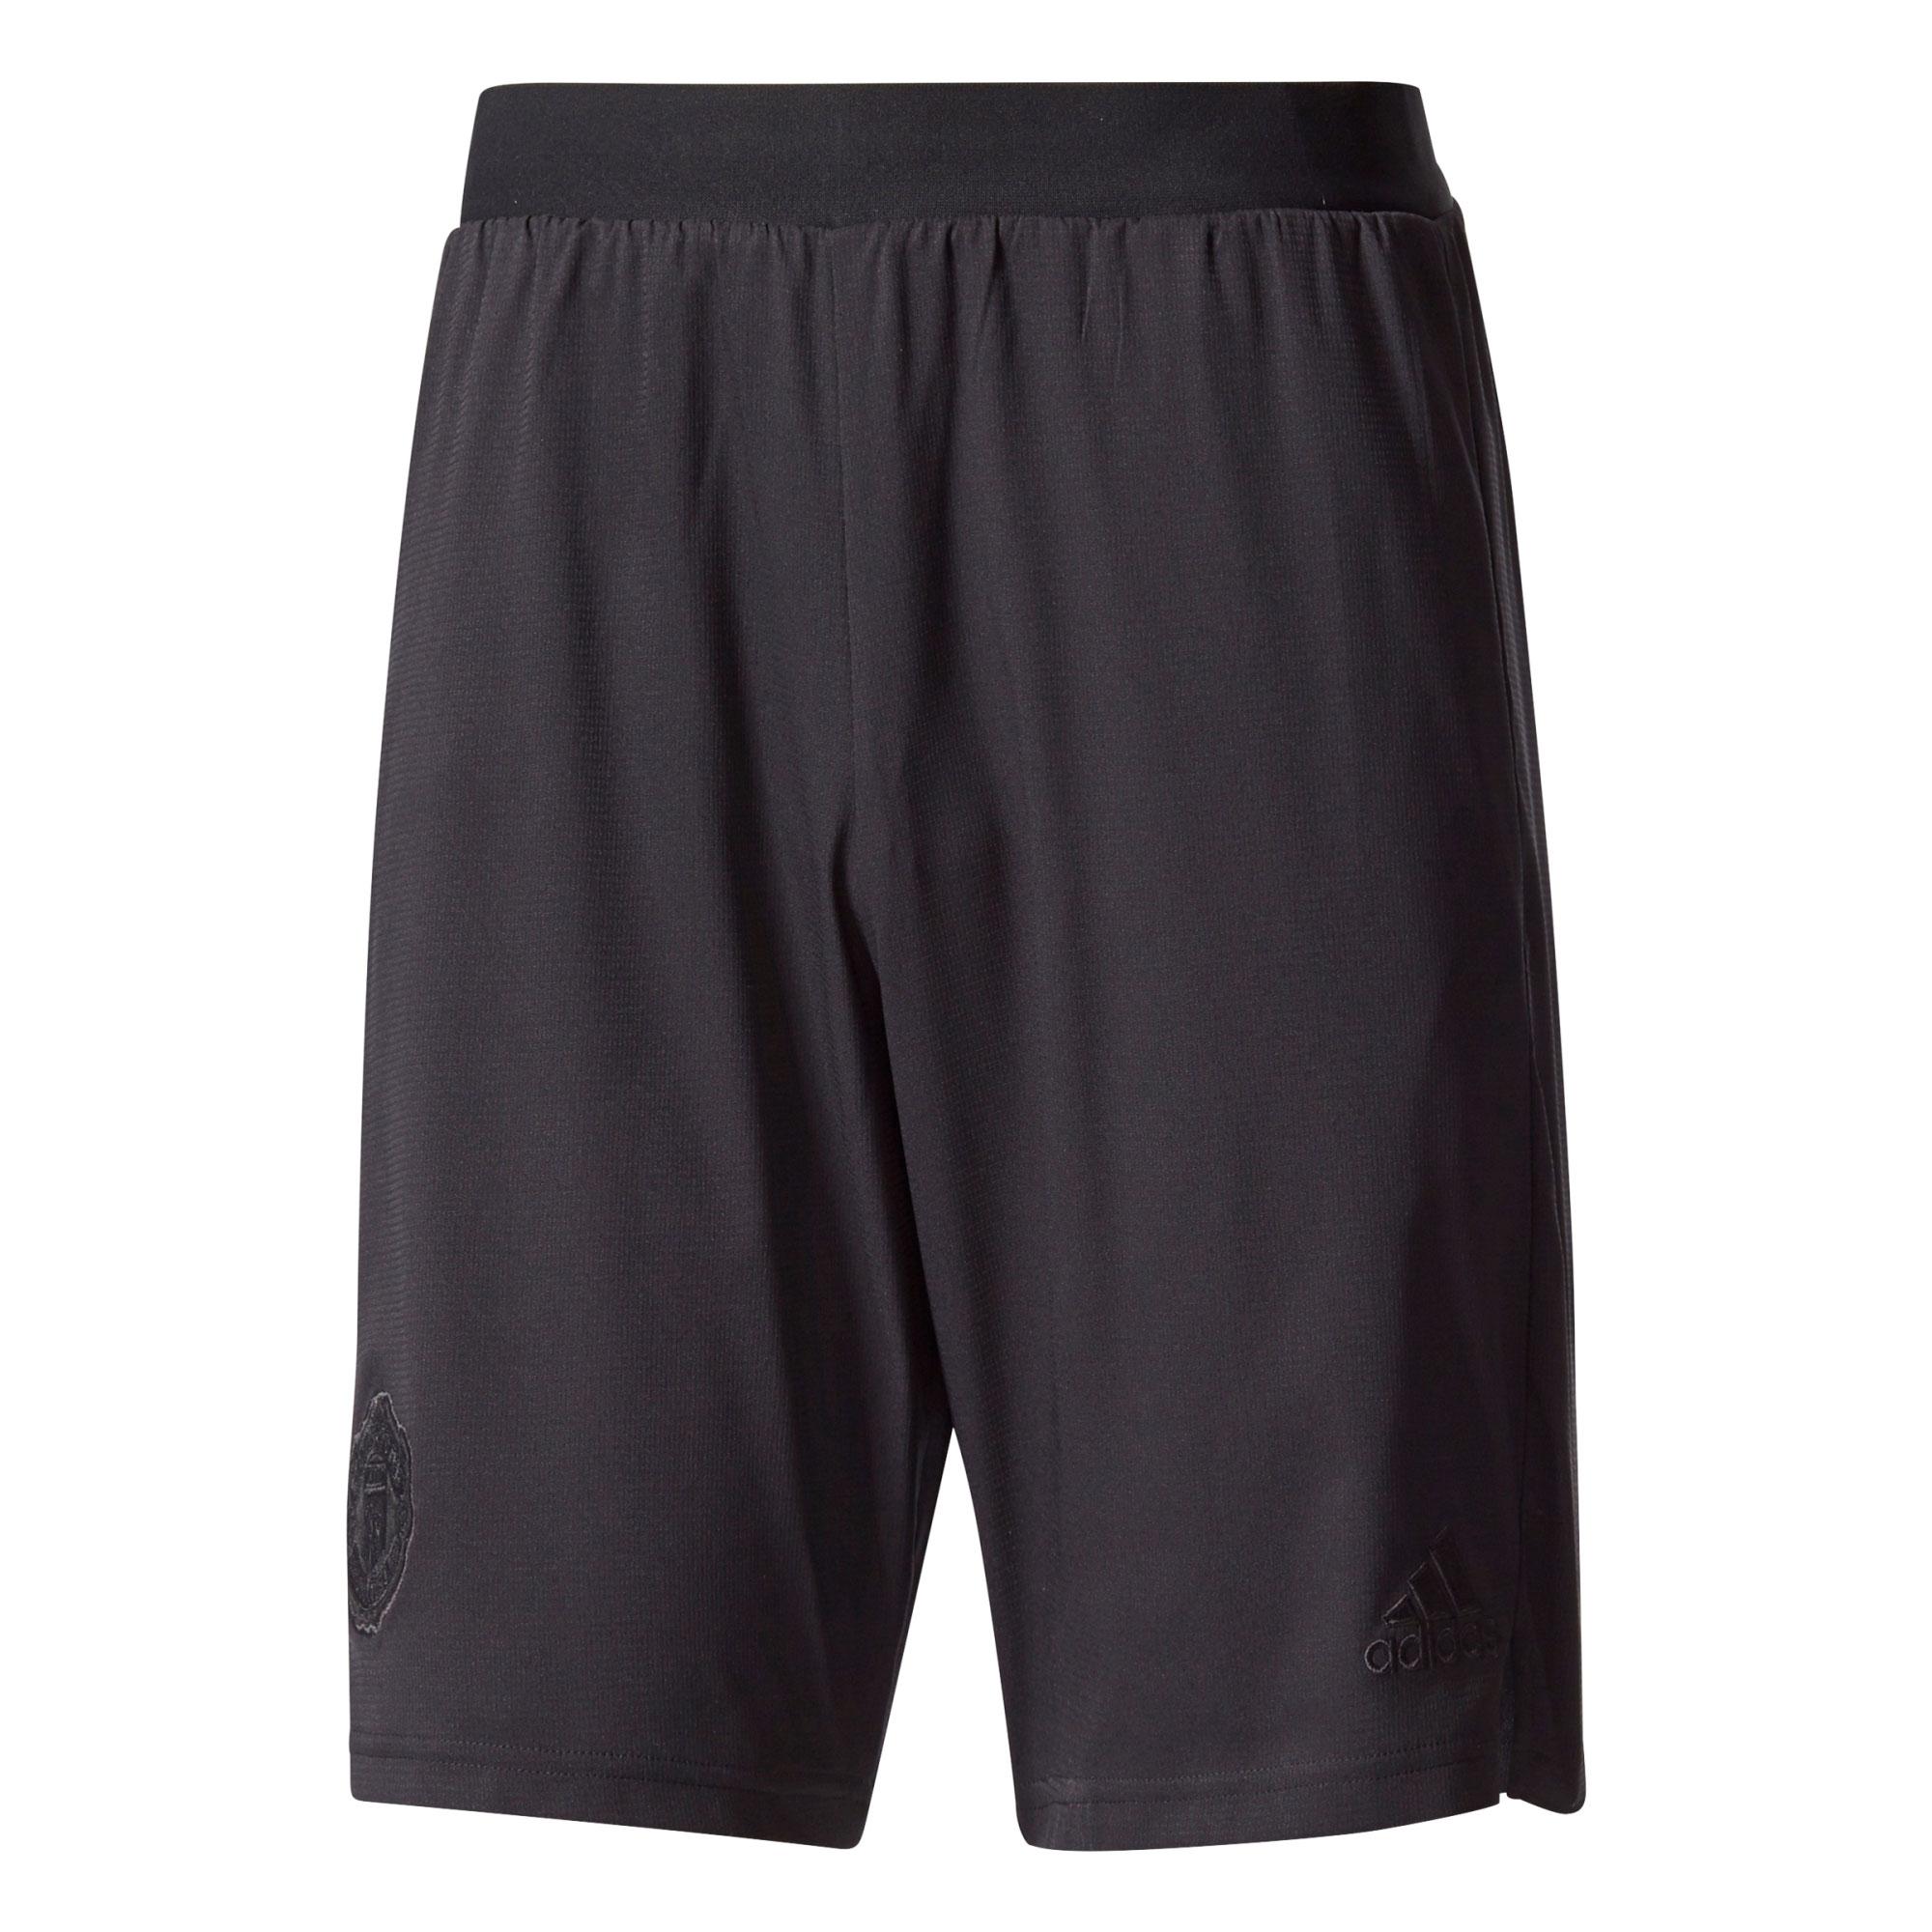 Manchester United Short - Black